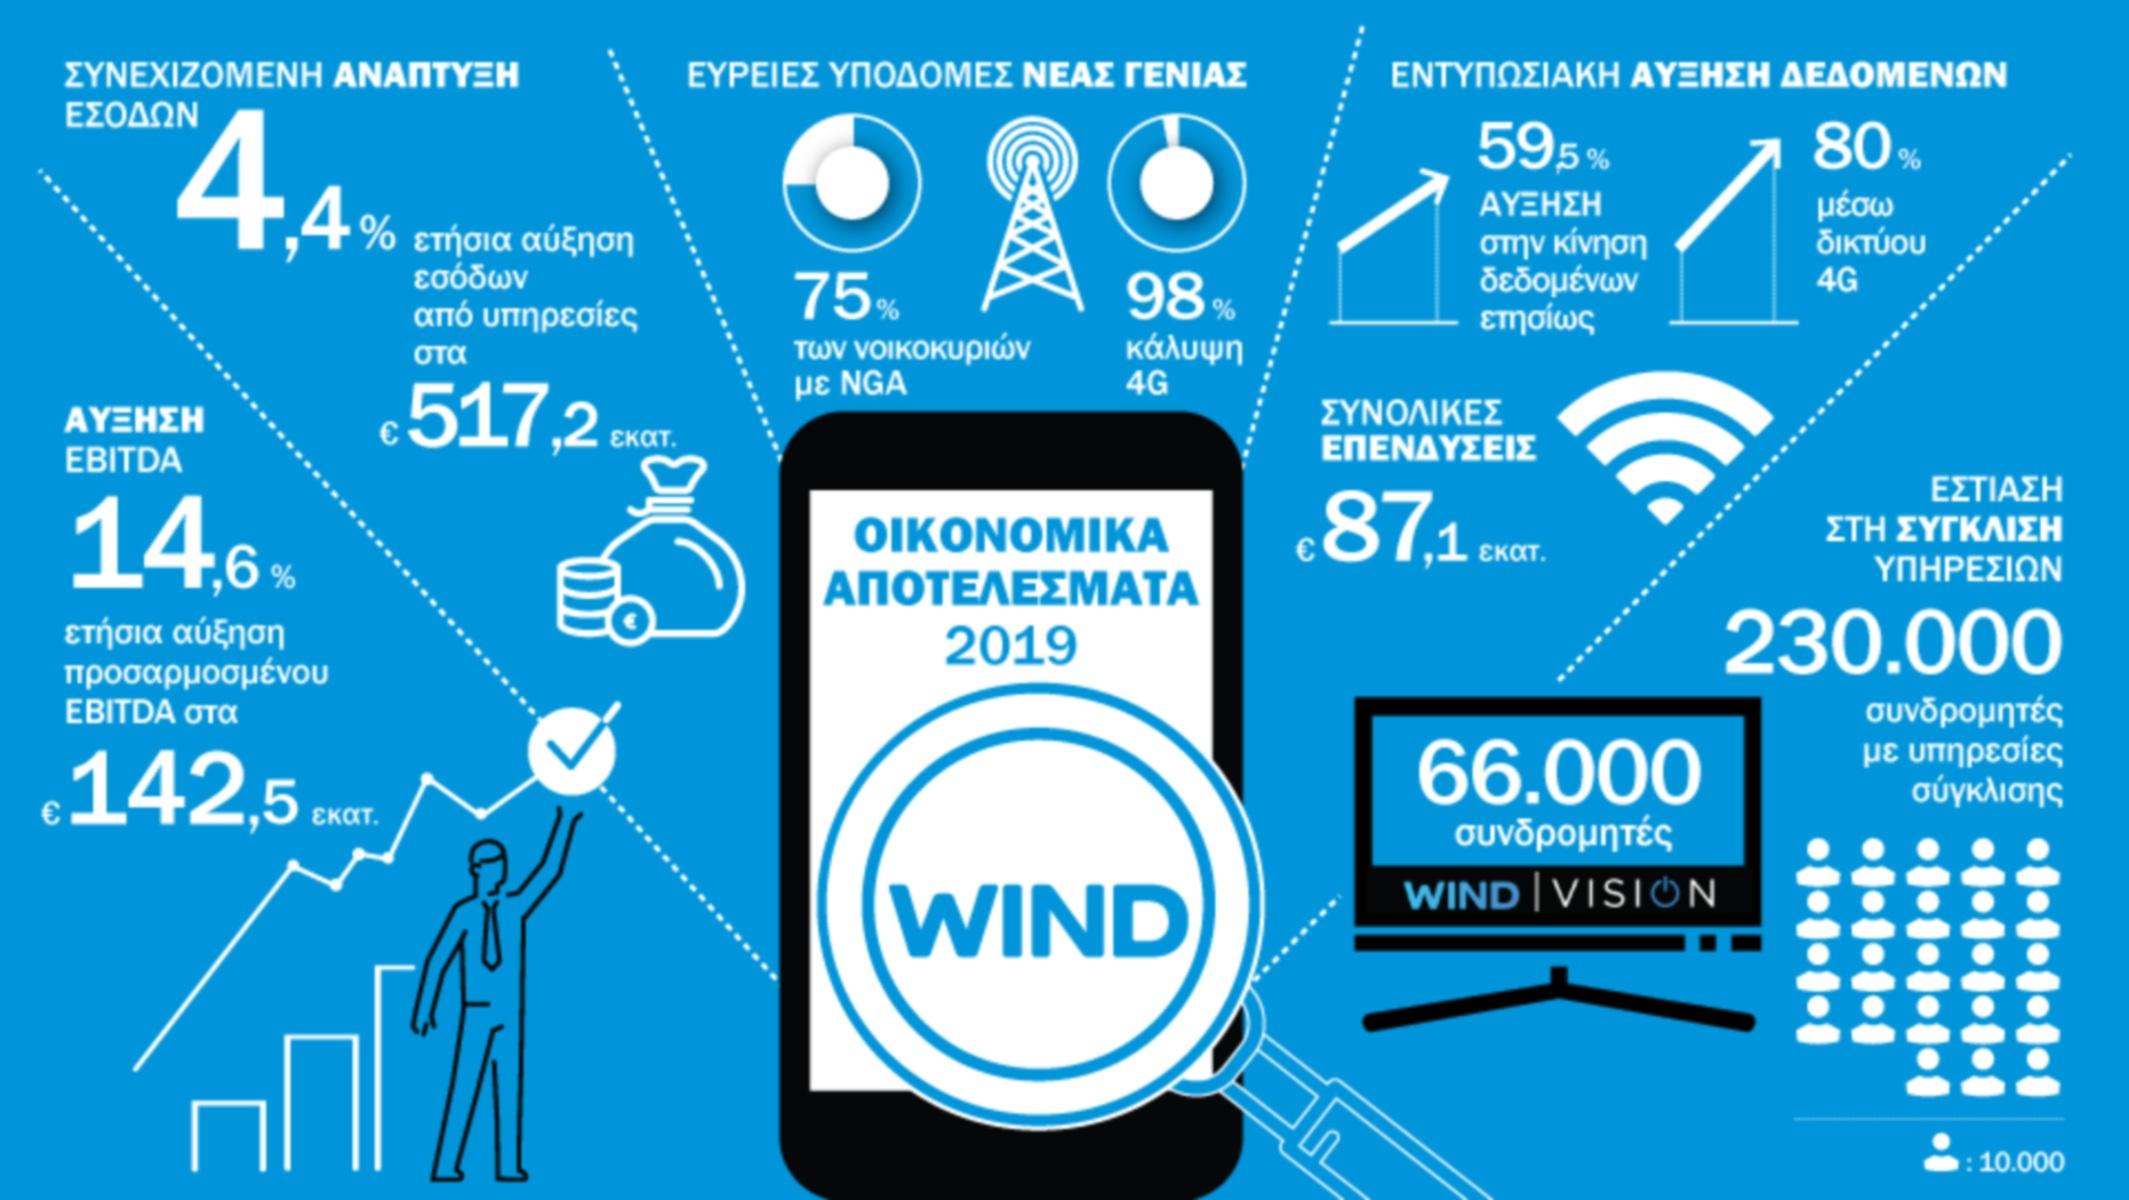 WIND: Ενισχύει τη θέση της στην αγορά και παίρνει προληπτικά μέτρα για τον κορονοϊό